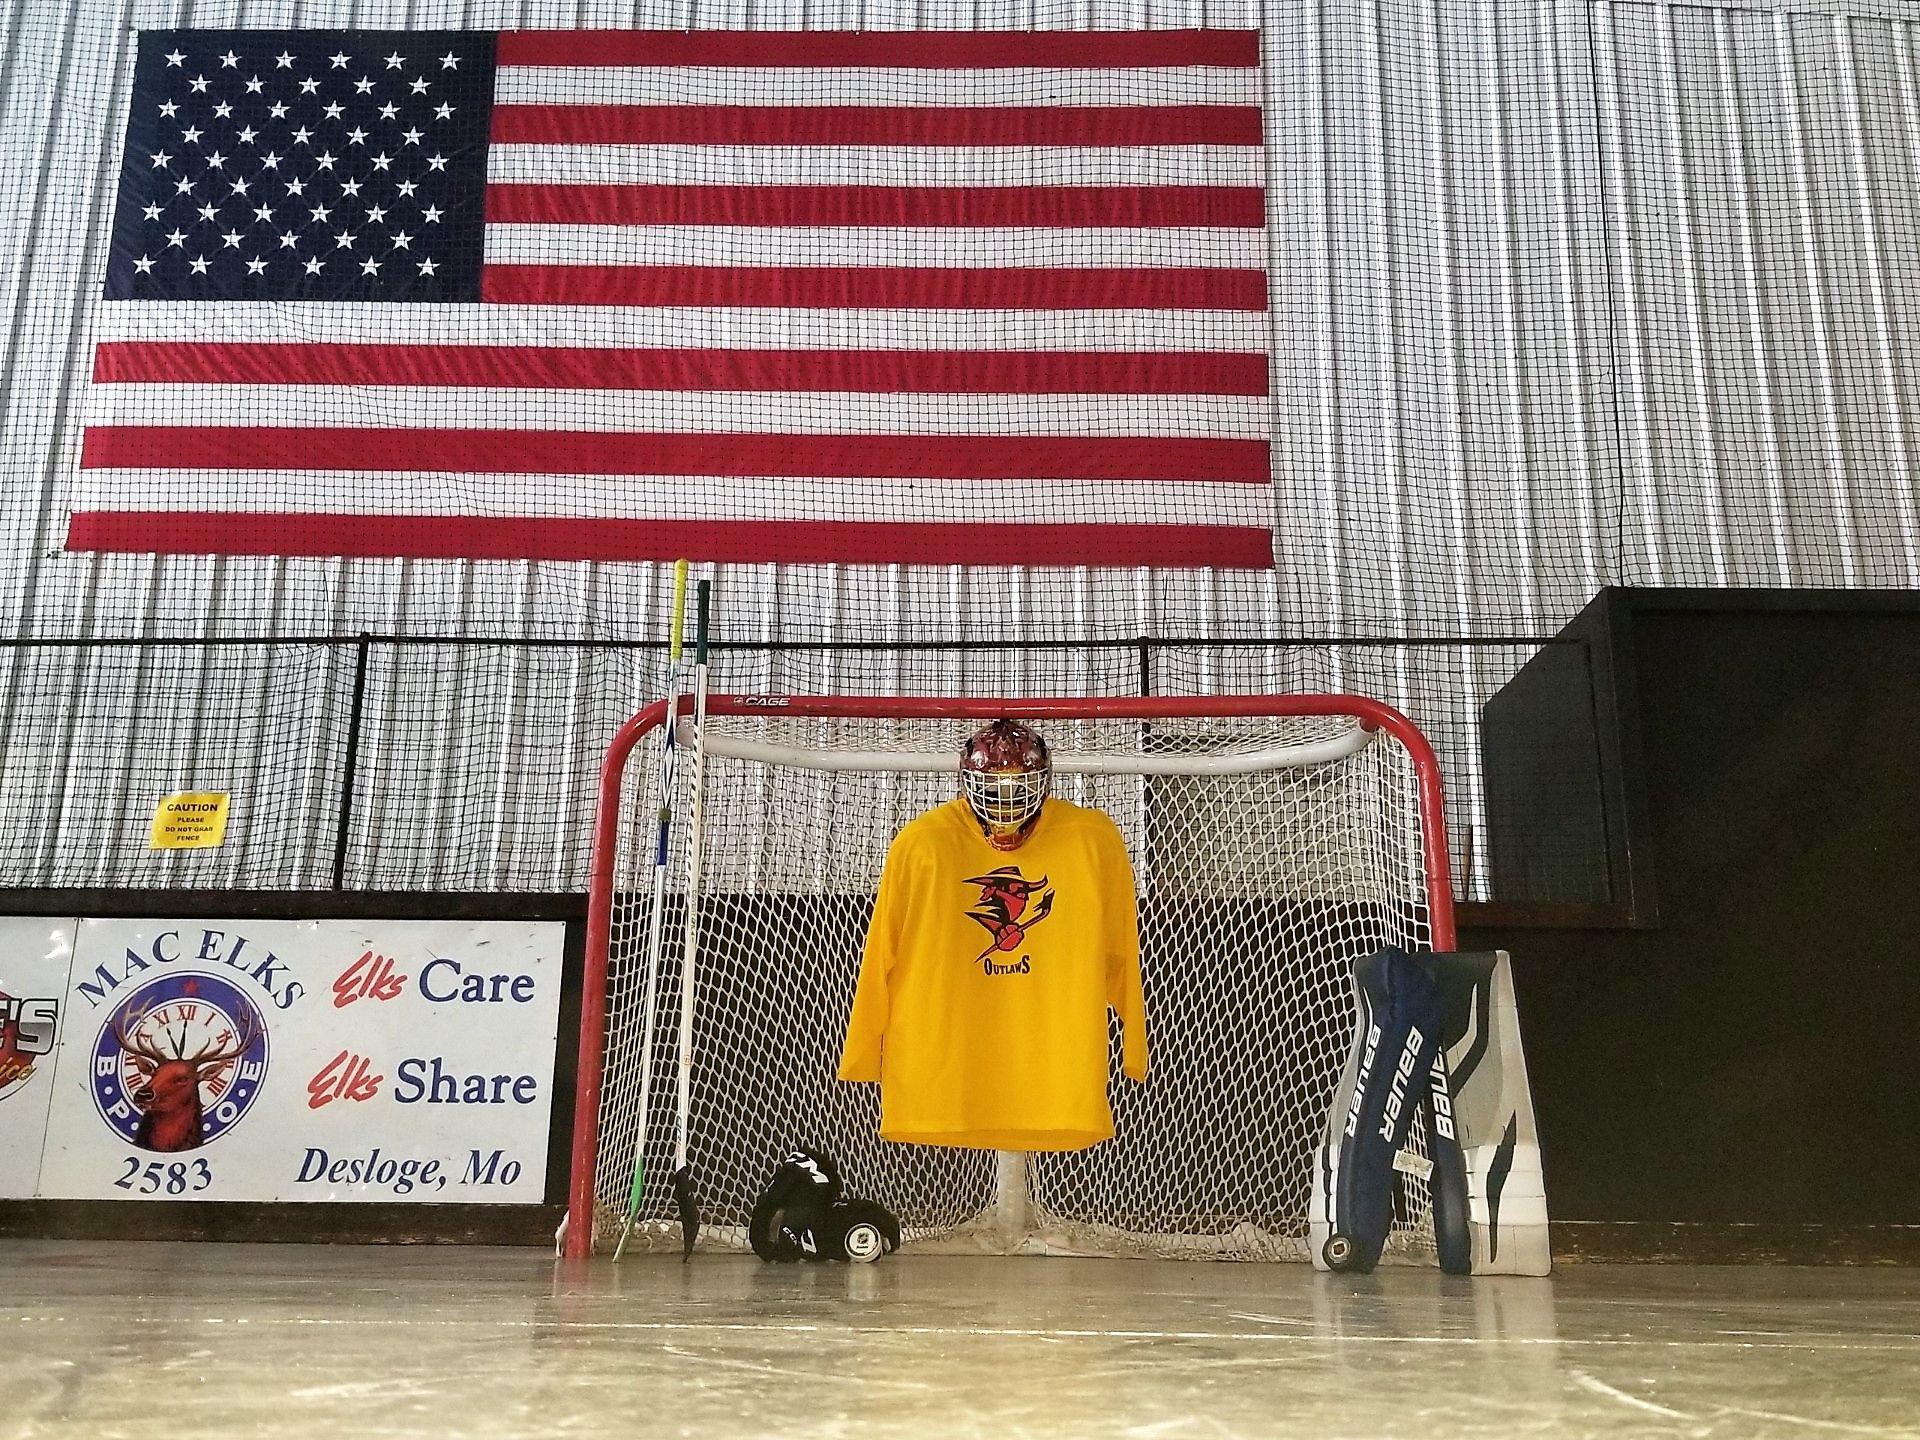 Hockey Gear - Front View Low Light 4.jpg